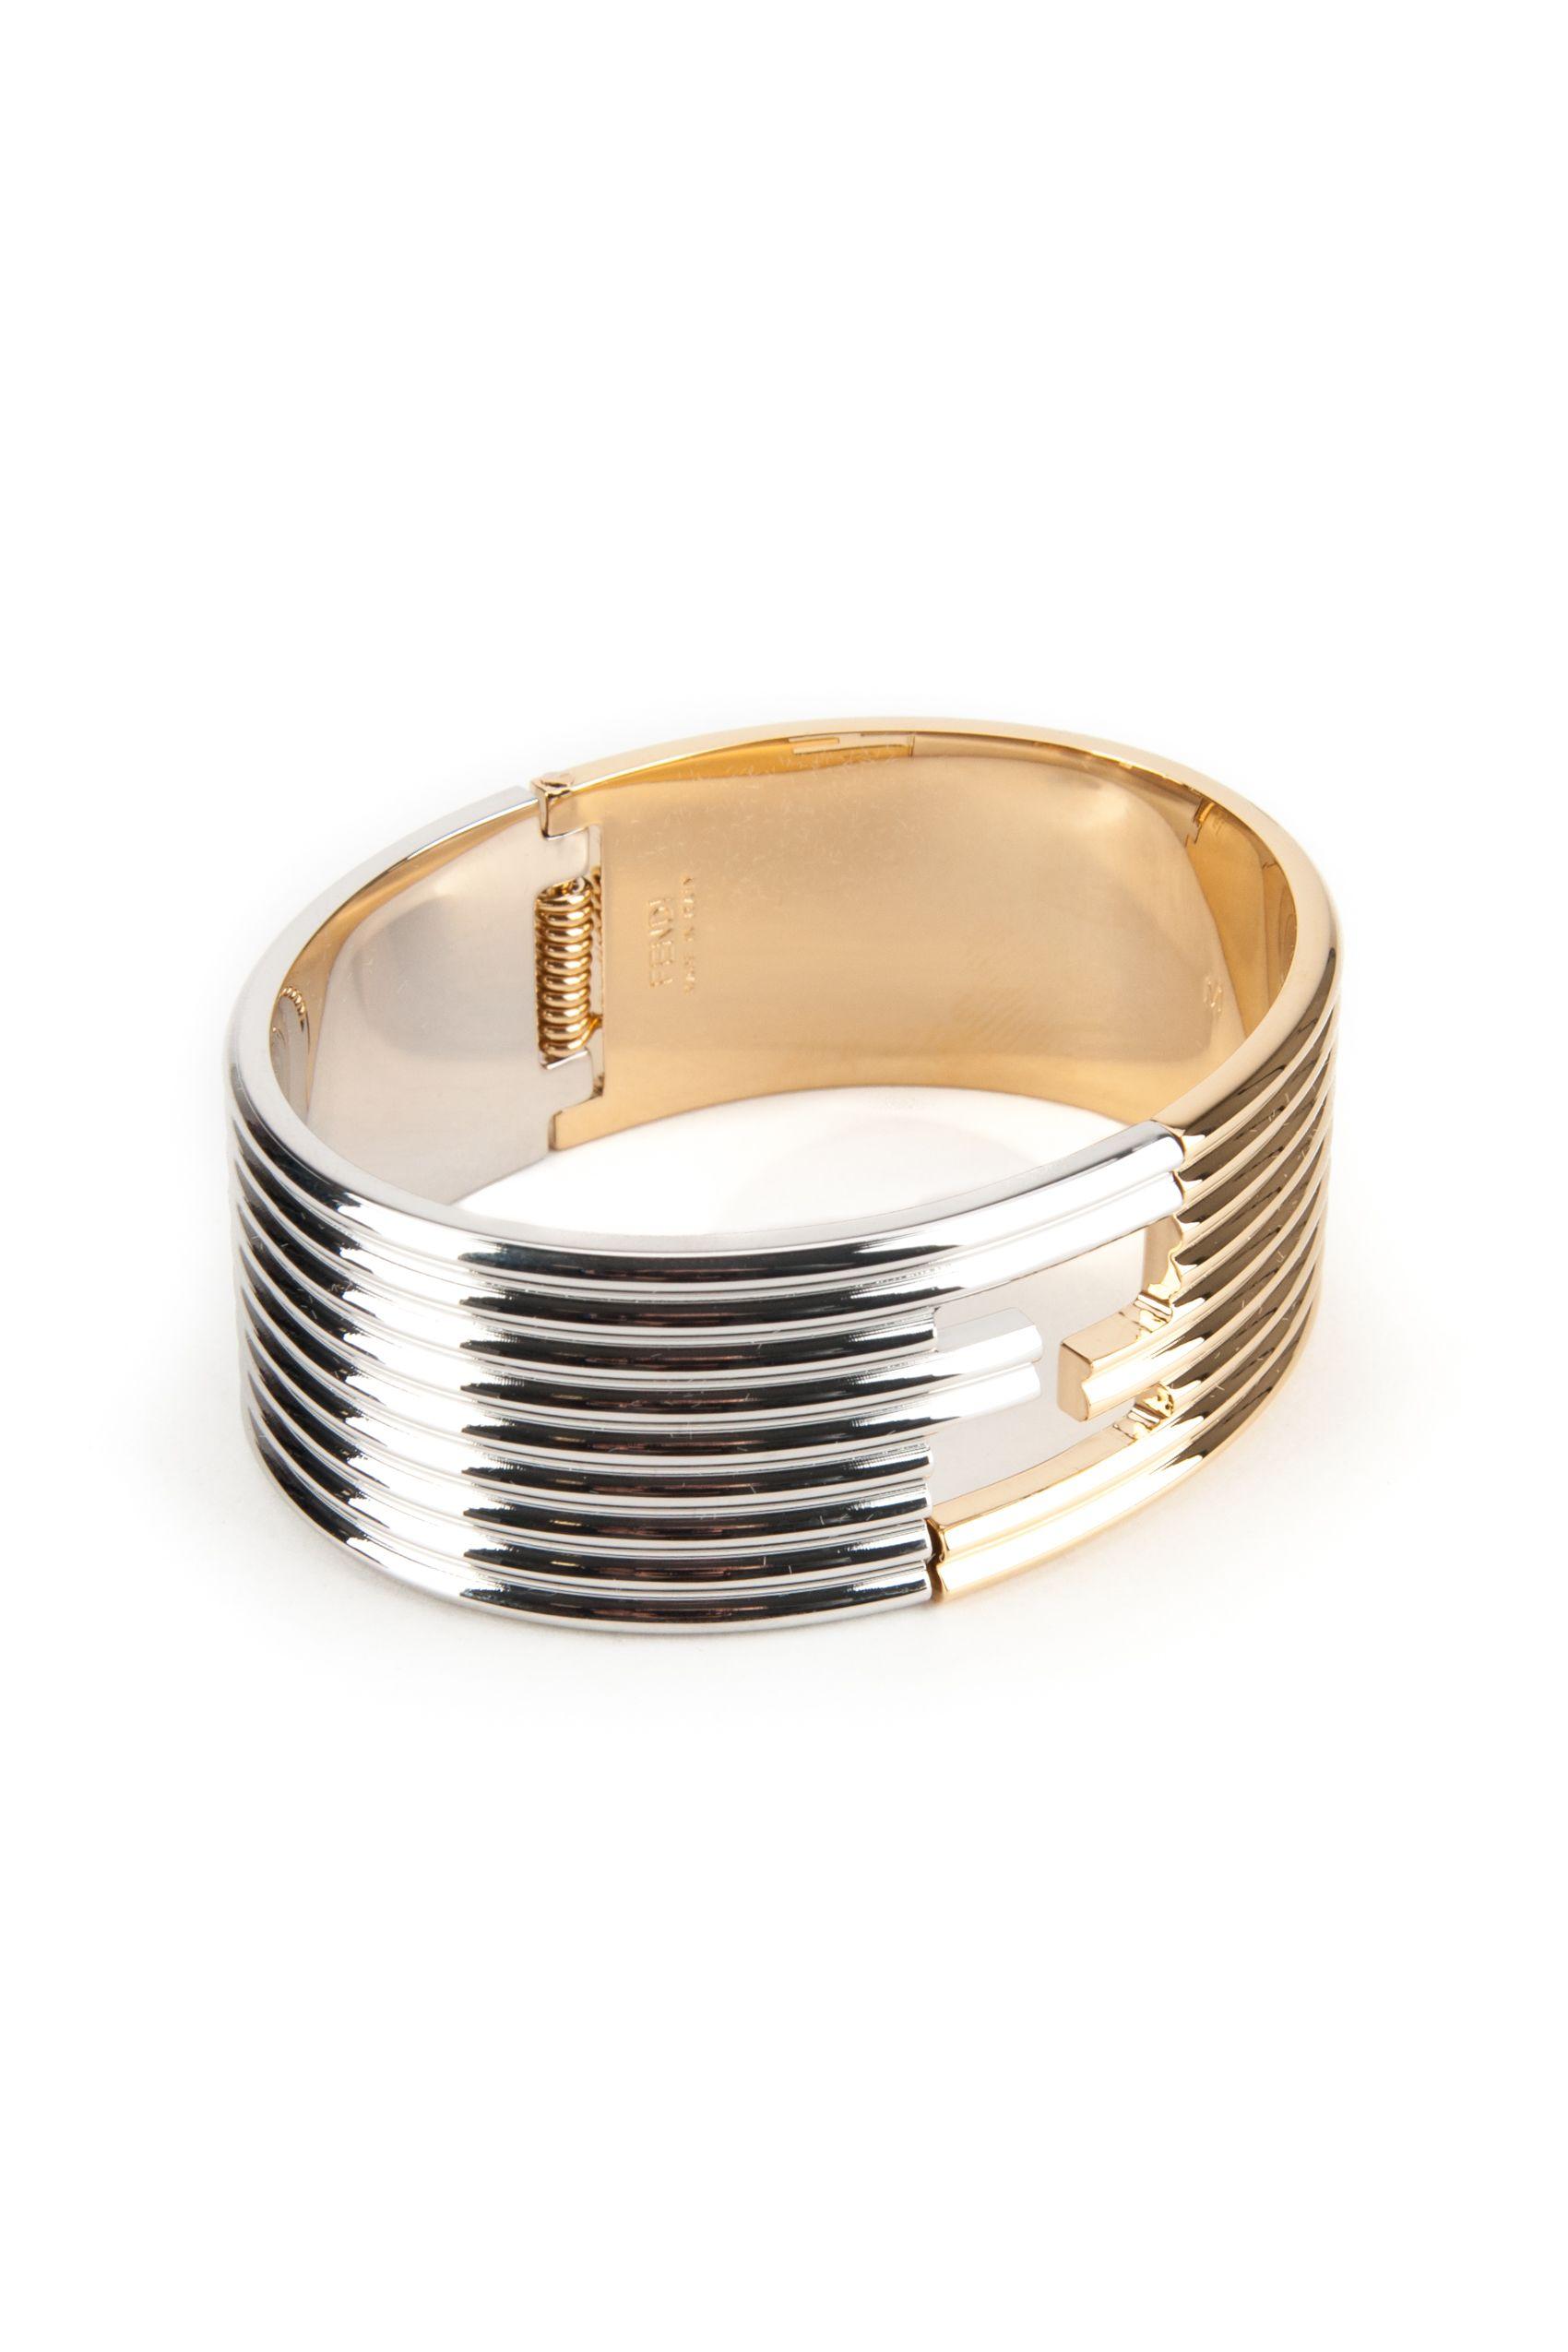 FENDI Solid Metal Bracelet in Oro Soft+Palladiometallico